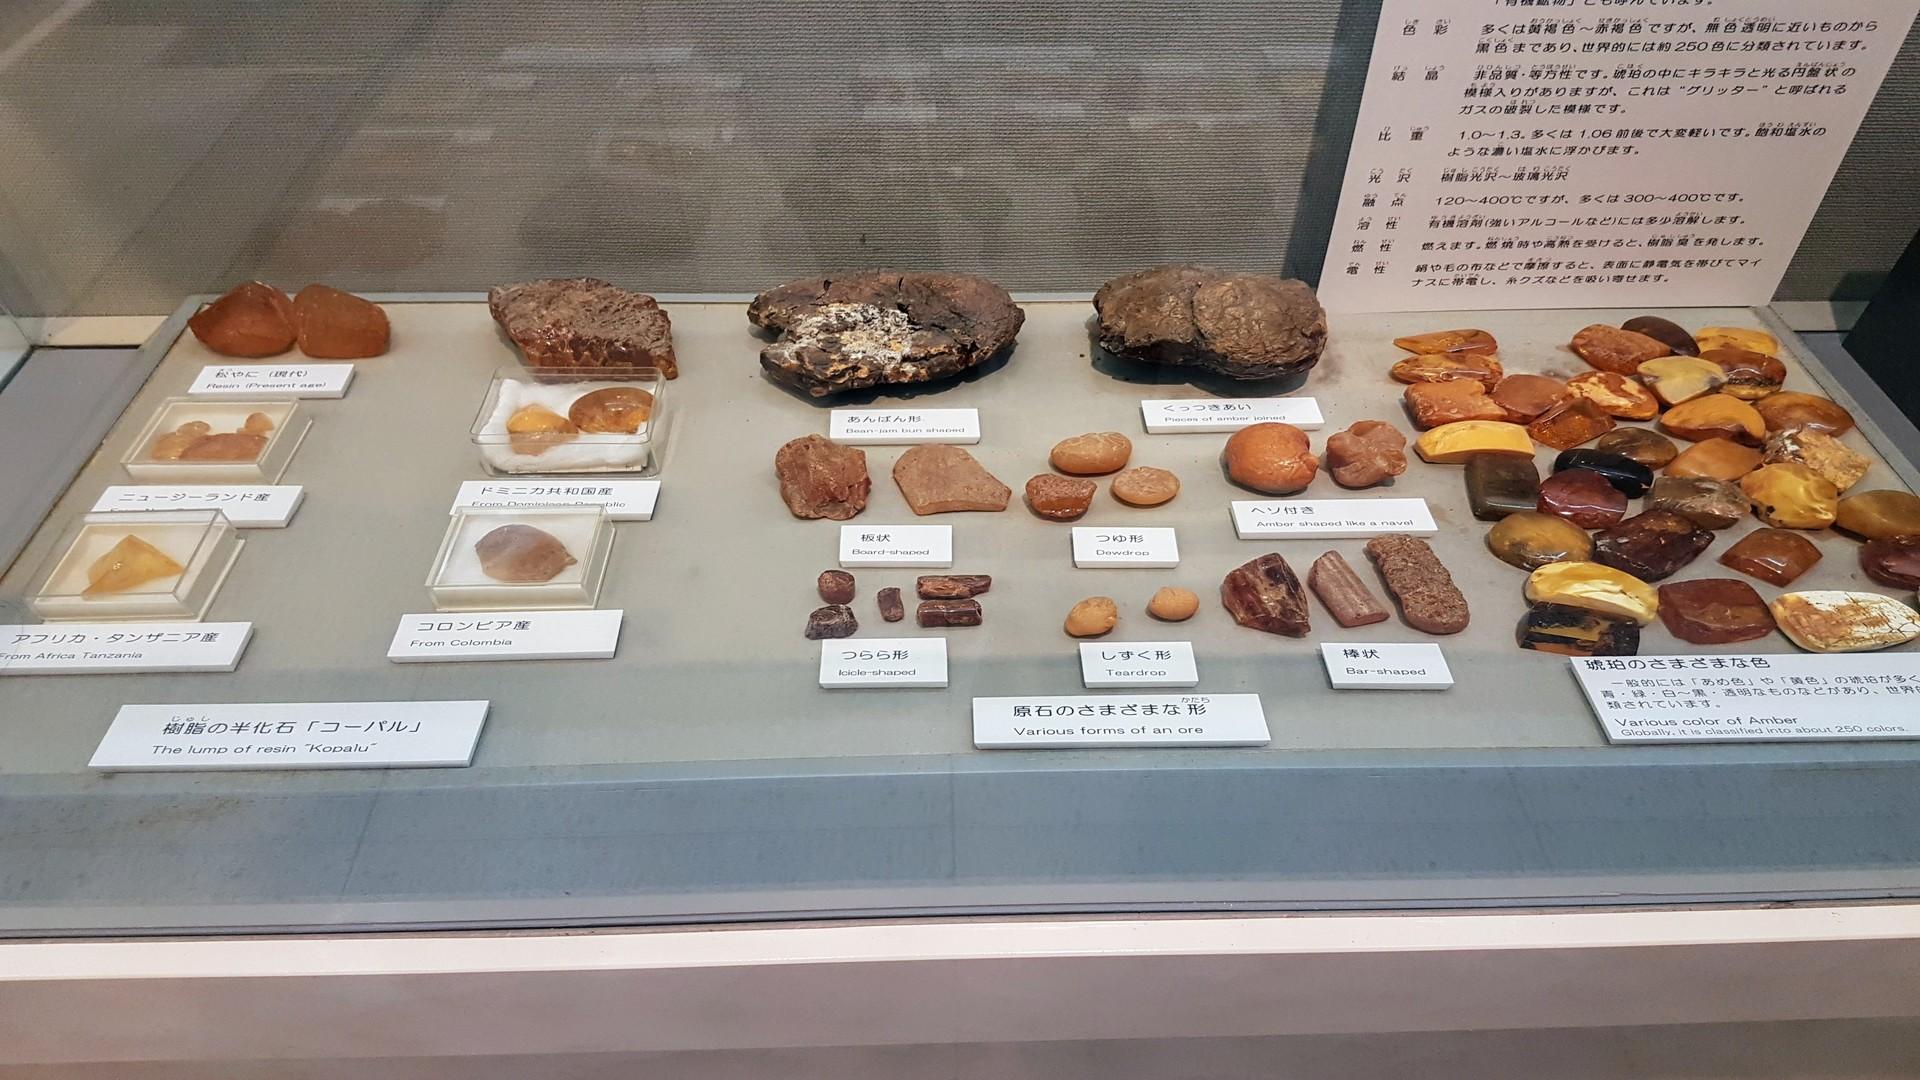 Des samples de différentes formes d'ambre au musée de l'ambre de kuji